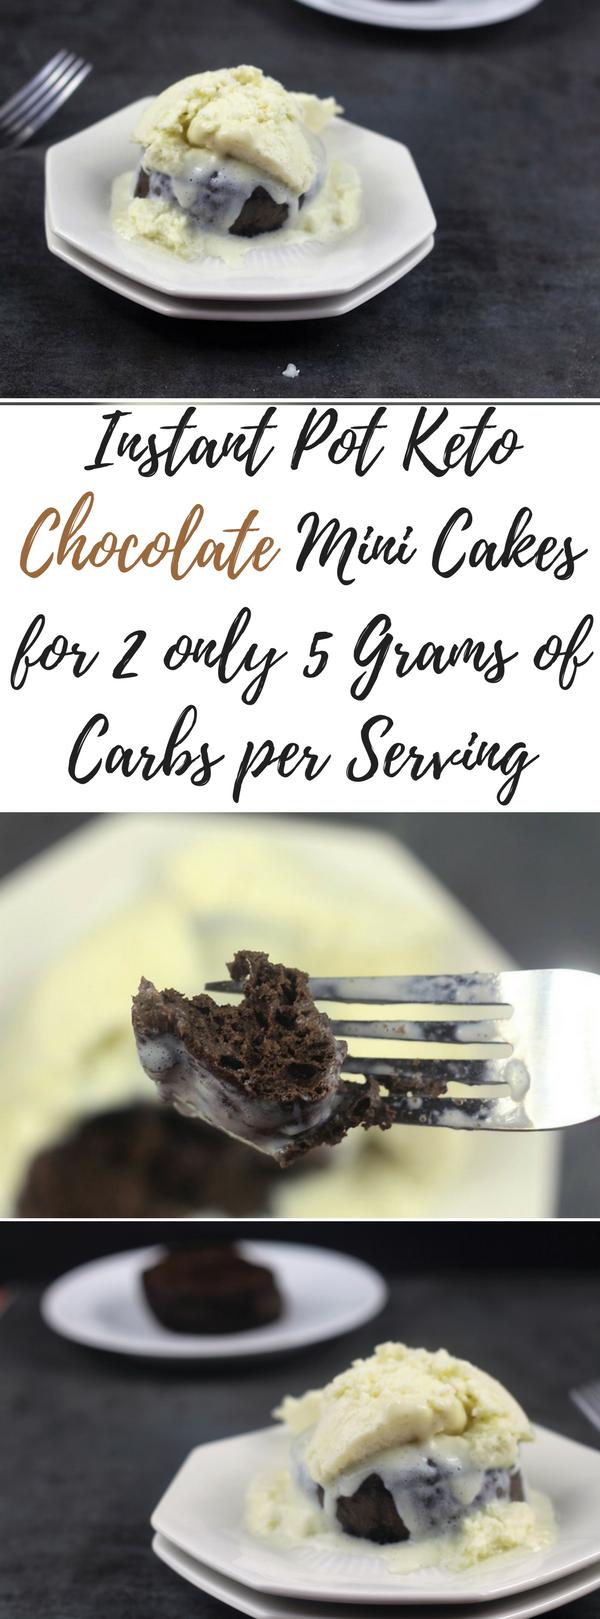 Instant Pot Keto Chocolate Mini Cakes